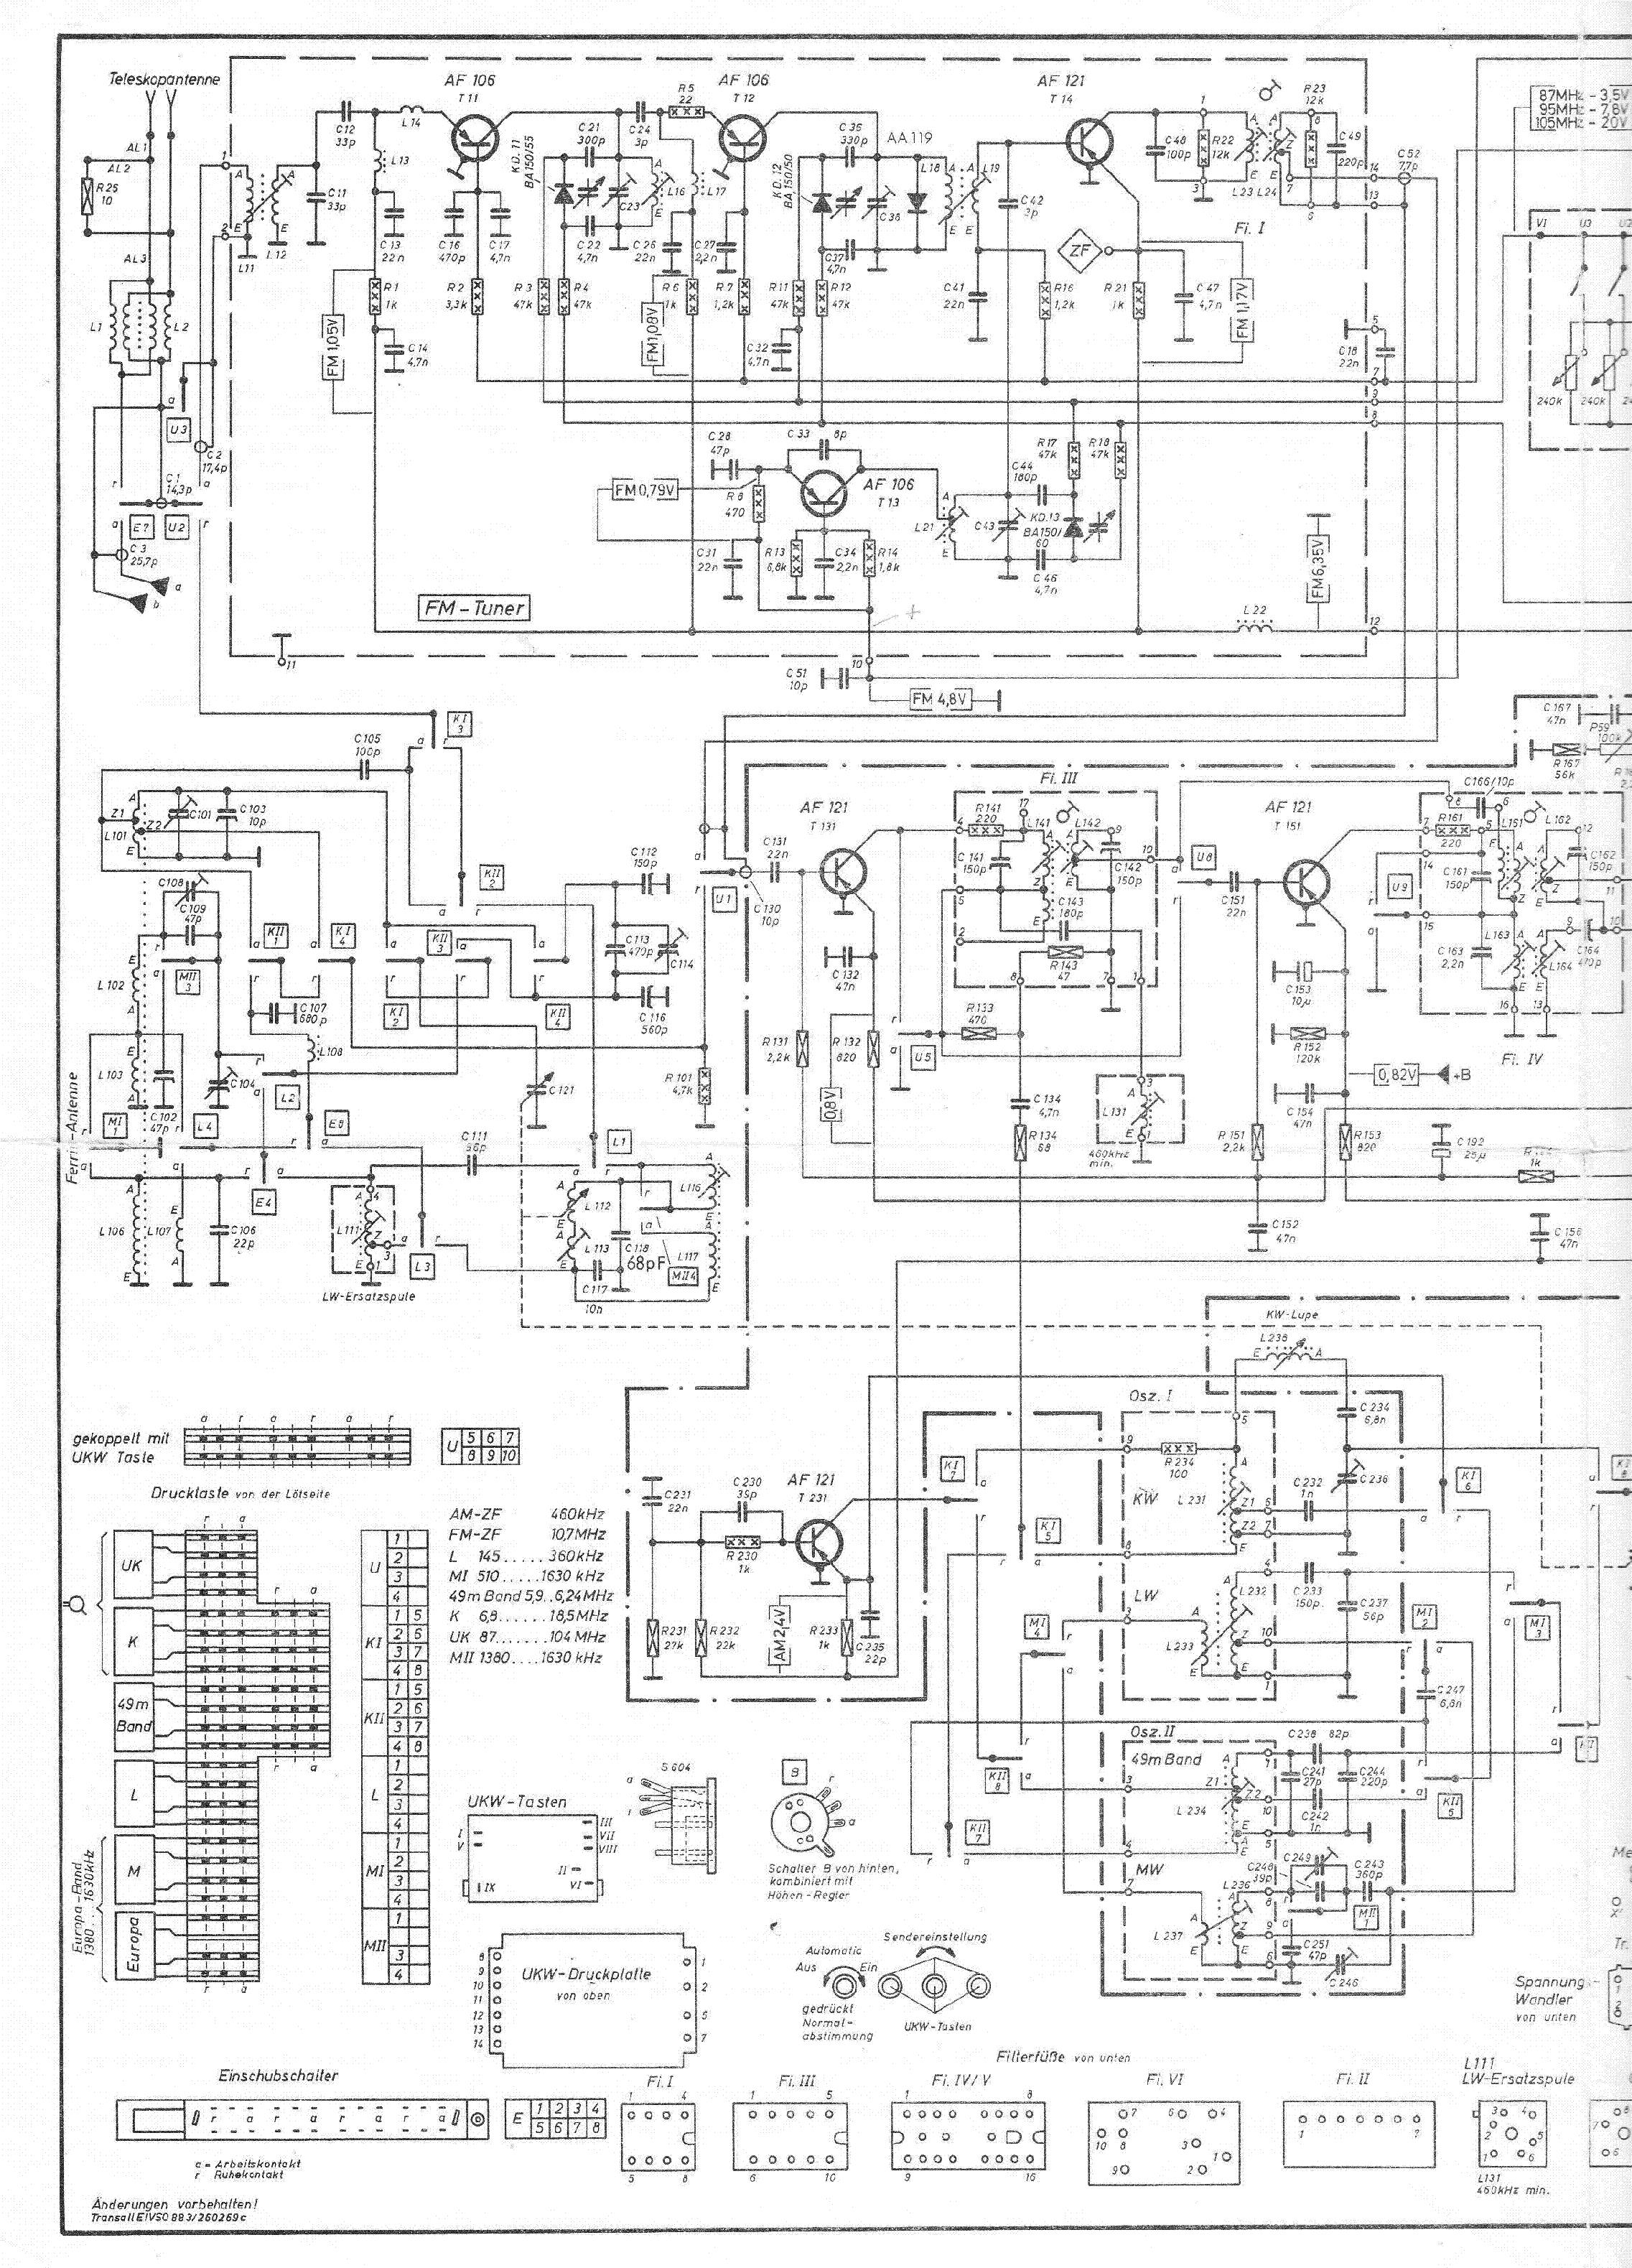 Groß D 104 Schaltplan Fotos - Schaltplan Serie Circuit Collection ...